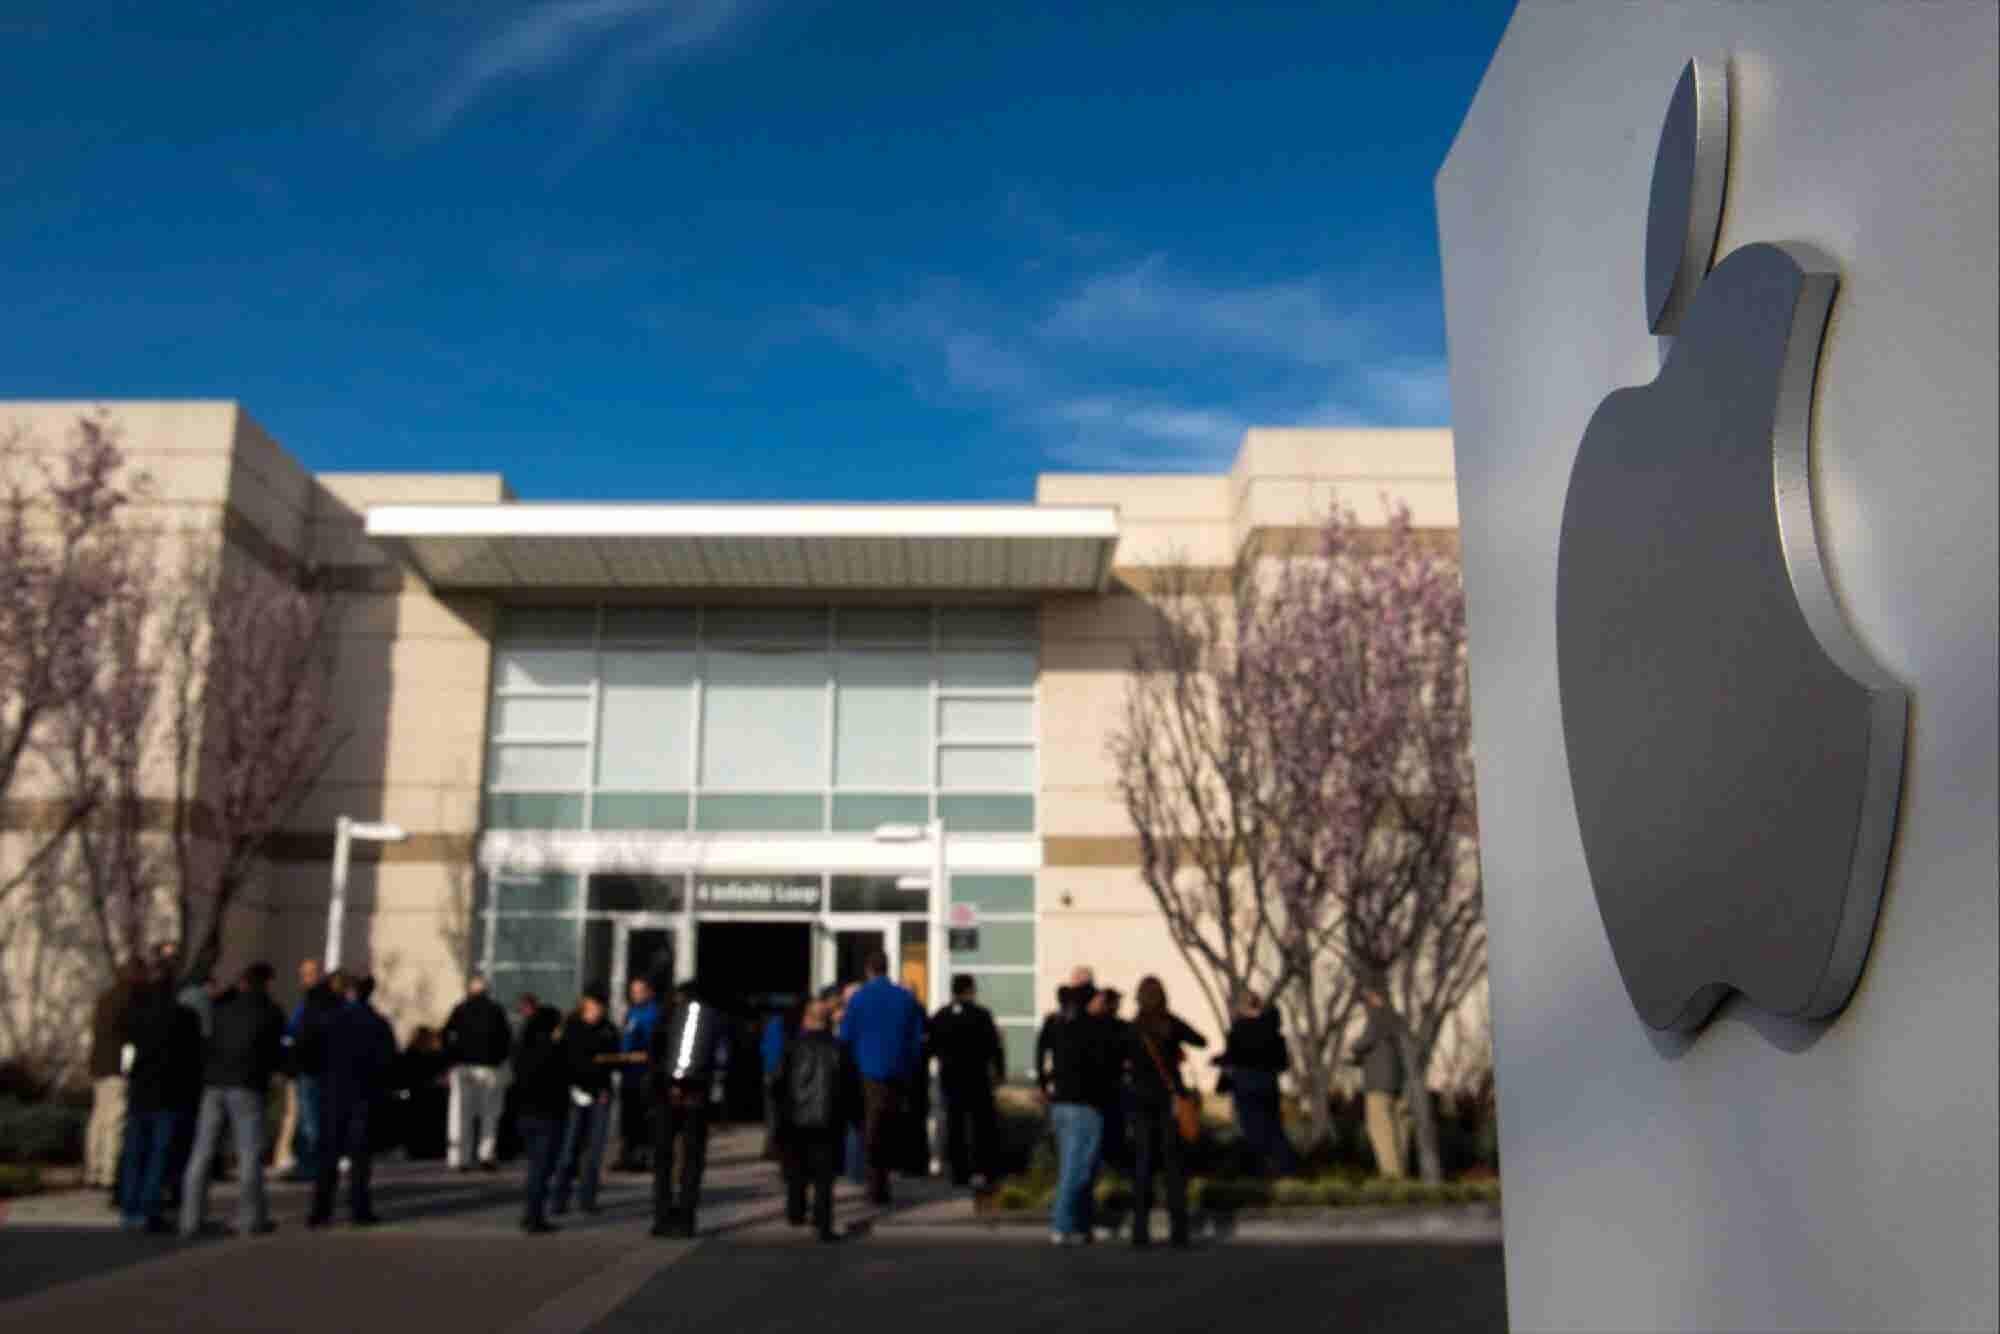 Police Investigating Death at Apple's California Headquarters